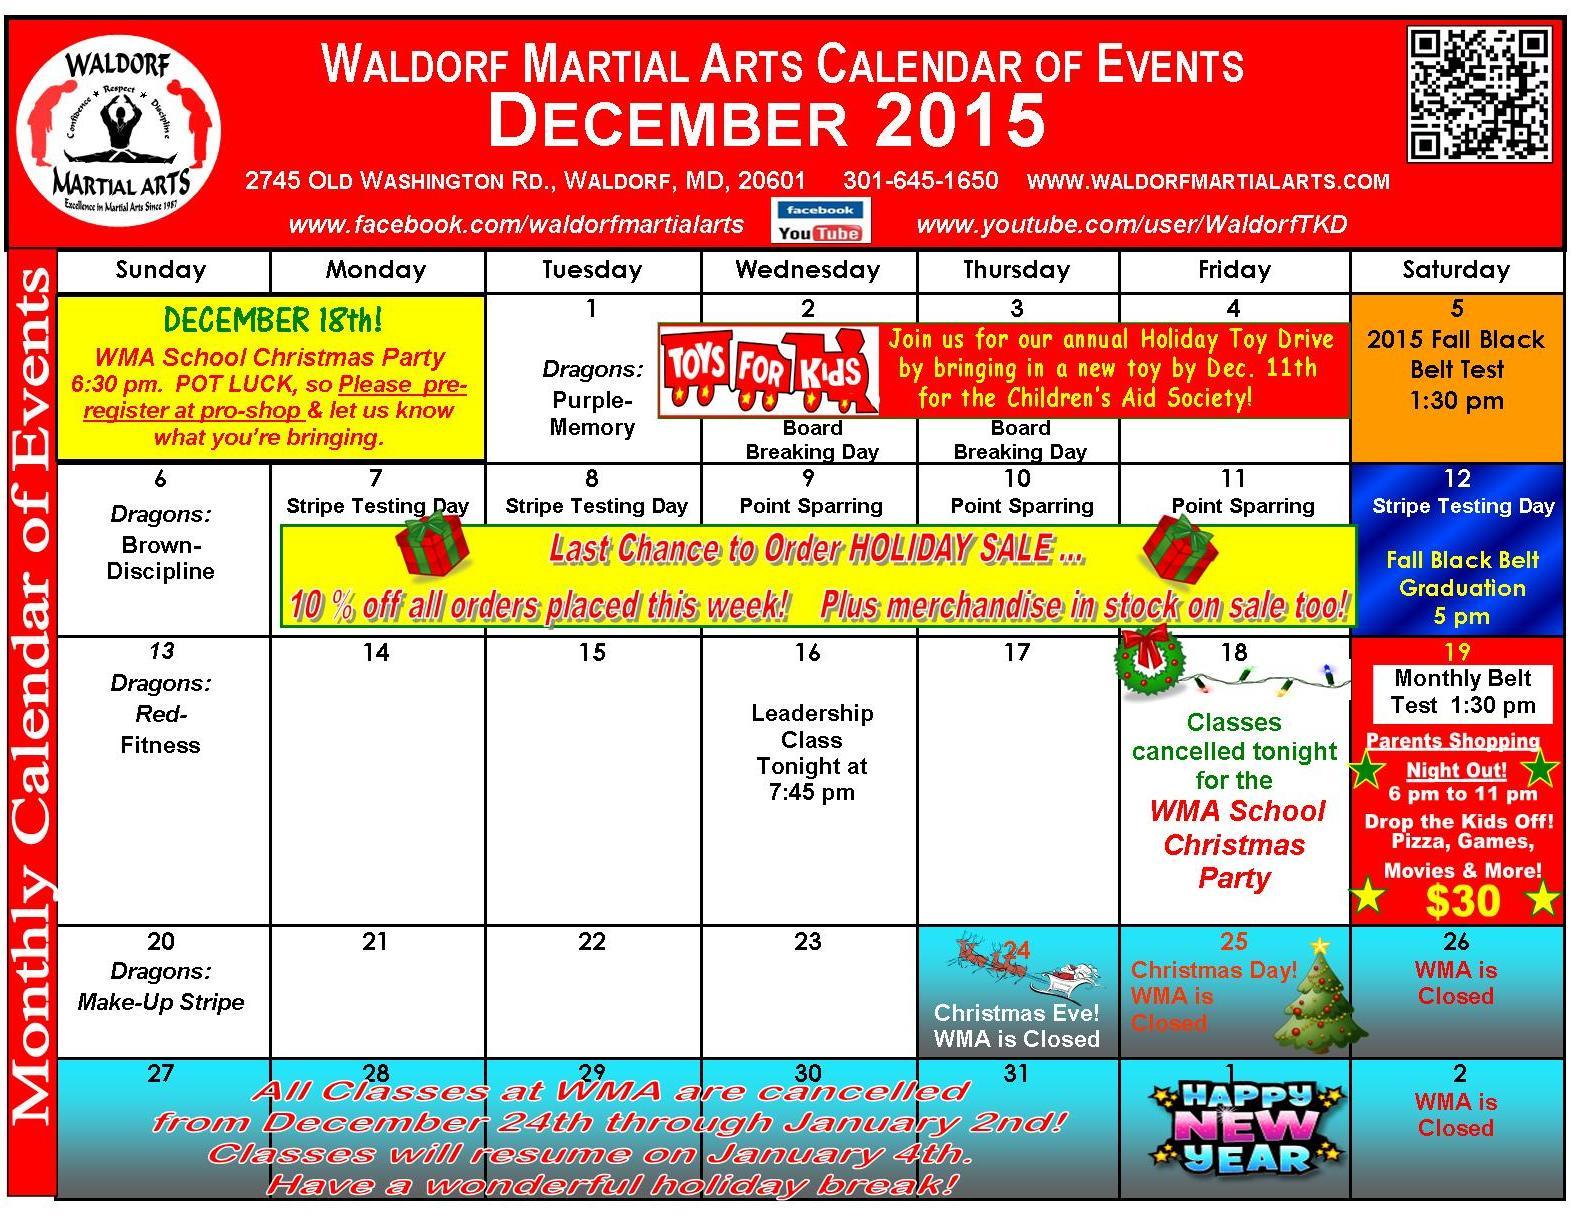 December 2015 Calendar of Events